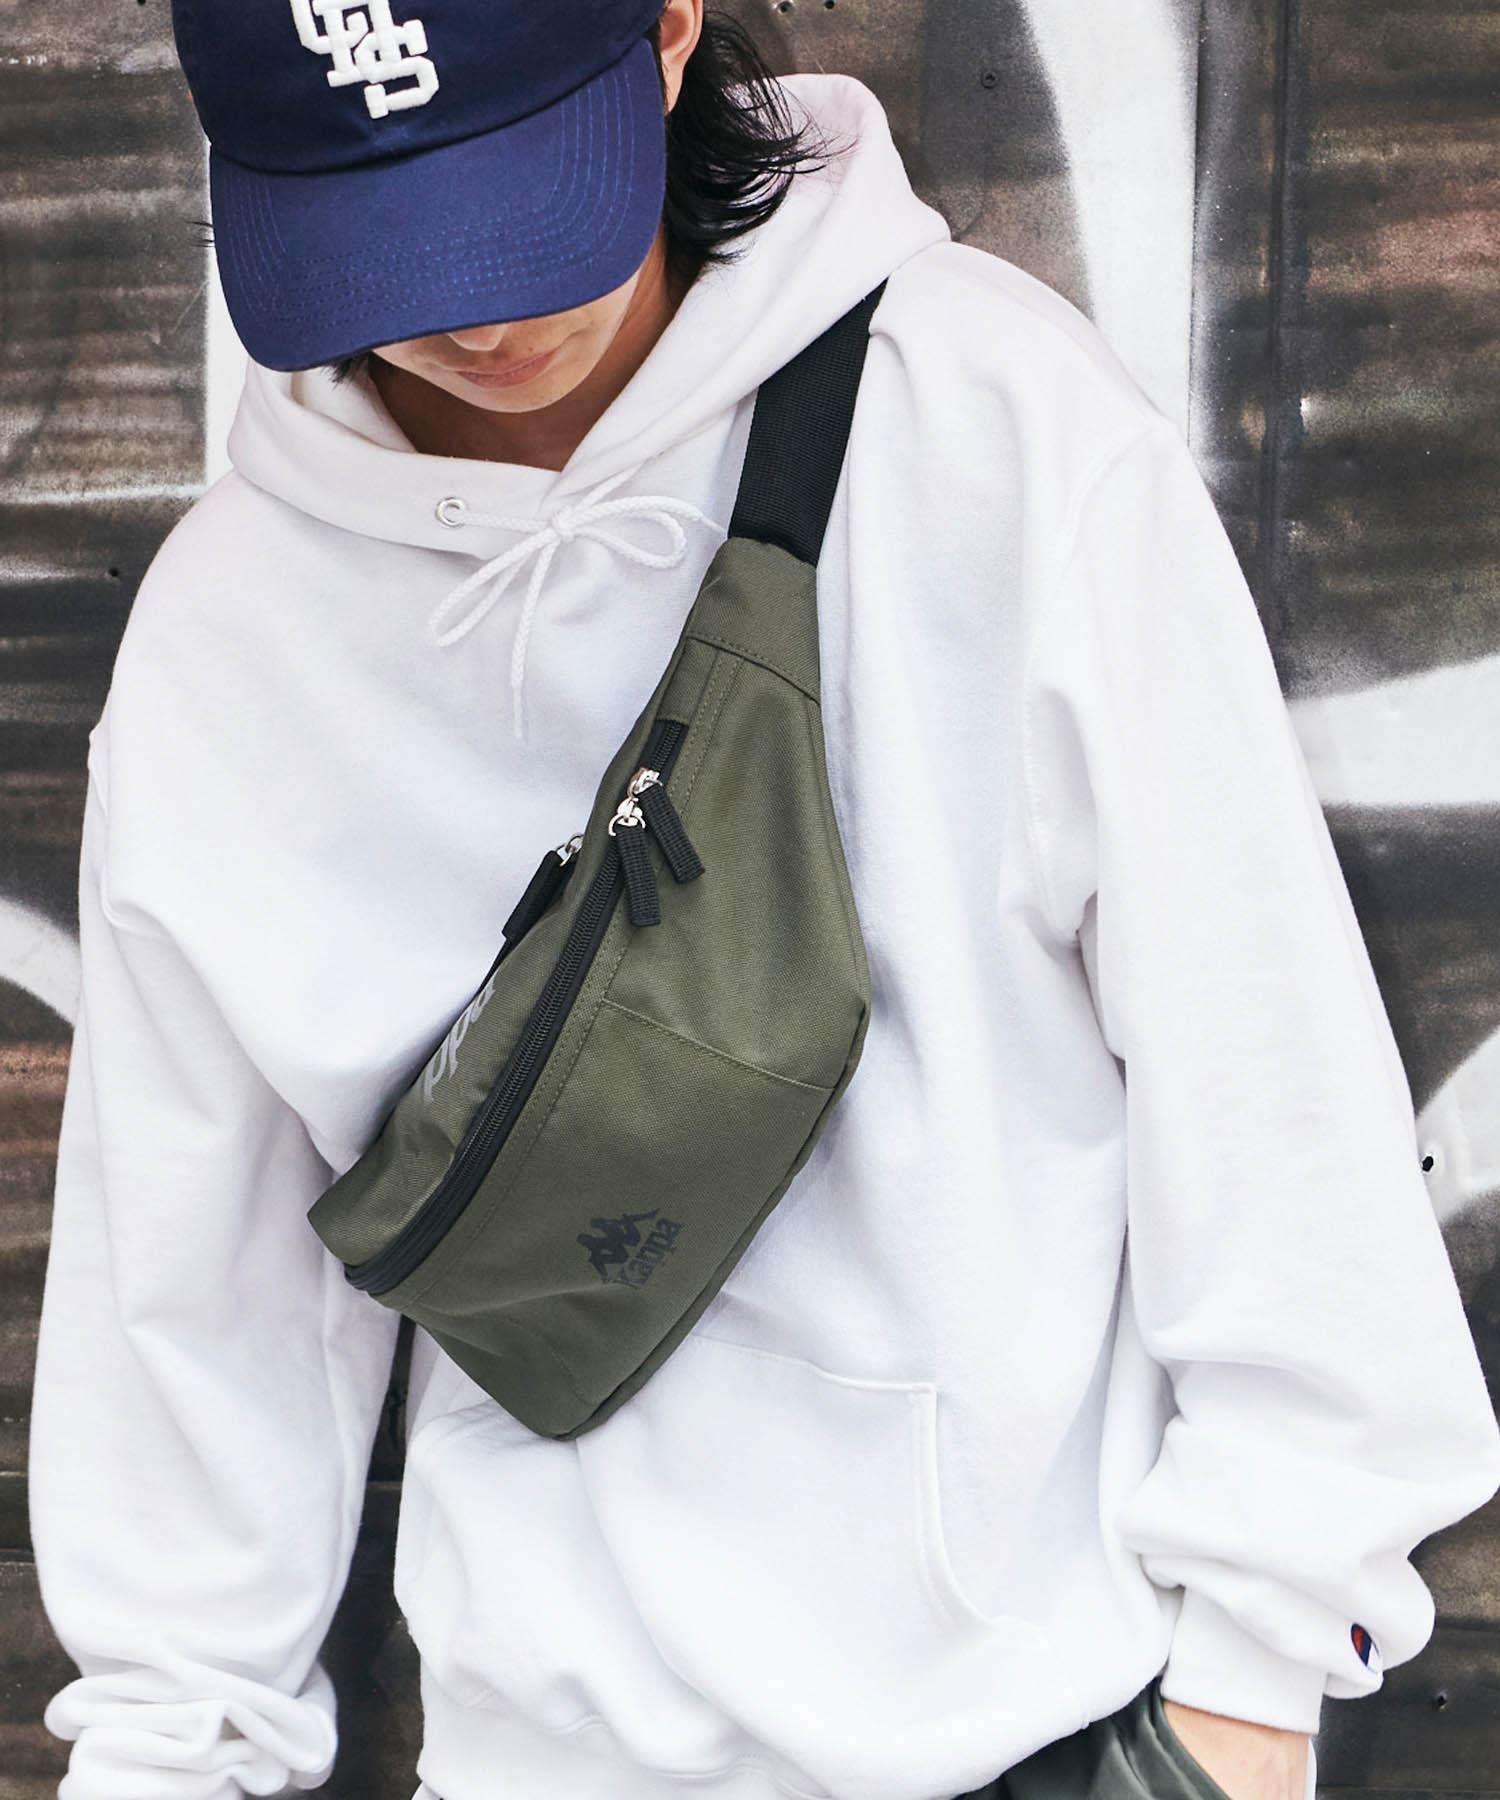 Kappa/カッパ 別注 ウエストバッグ